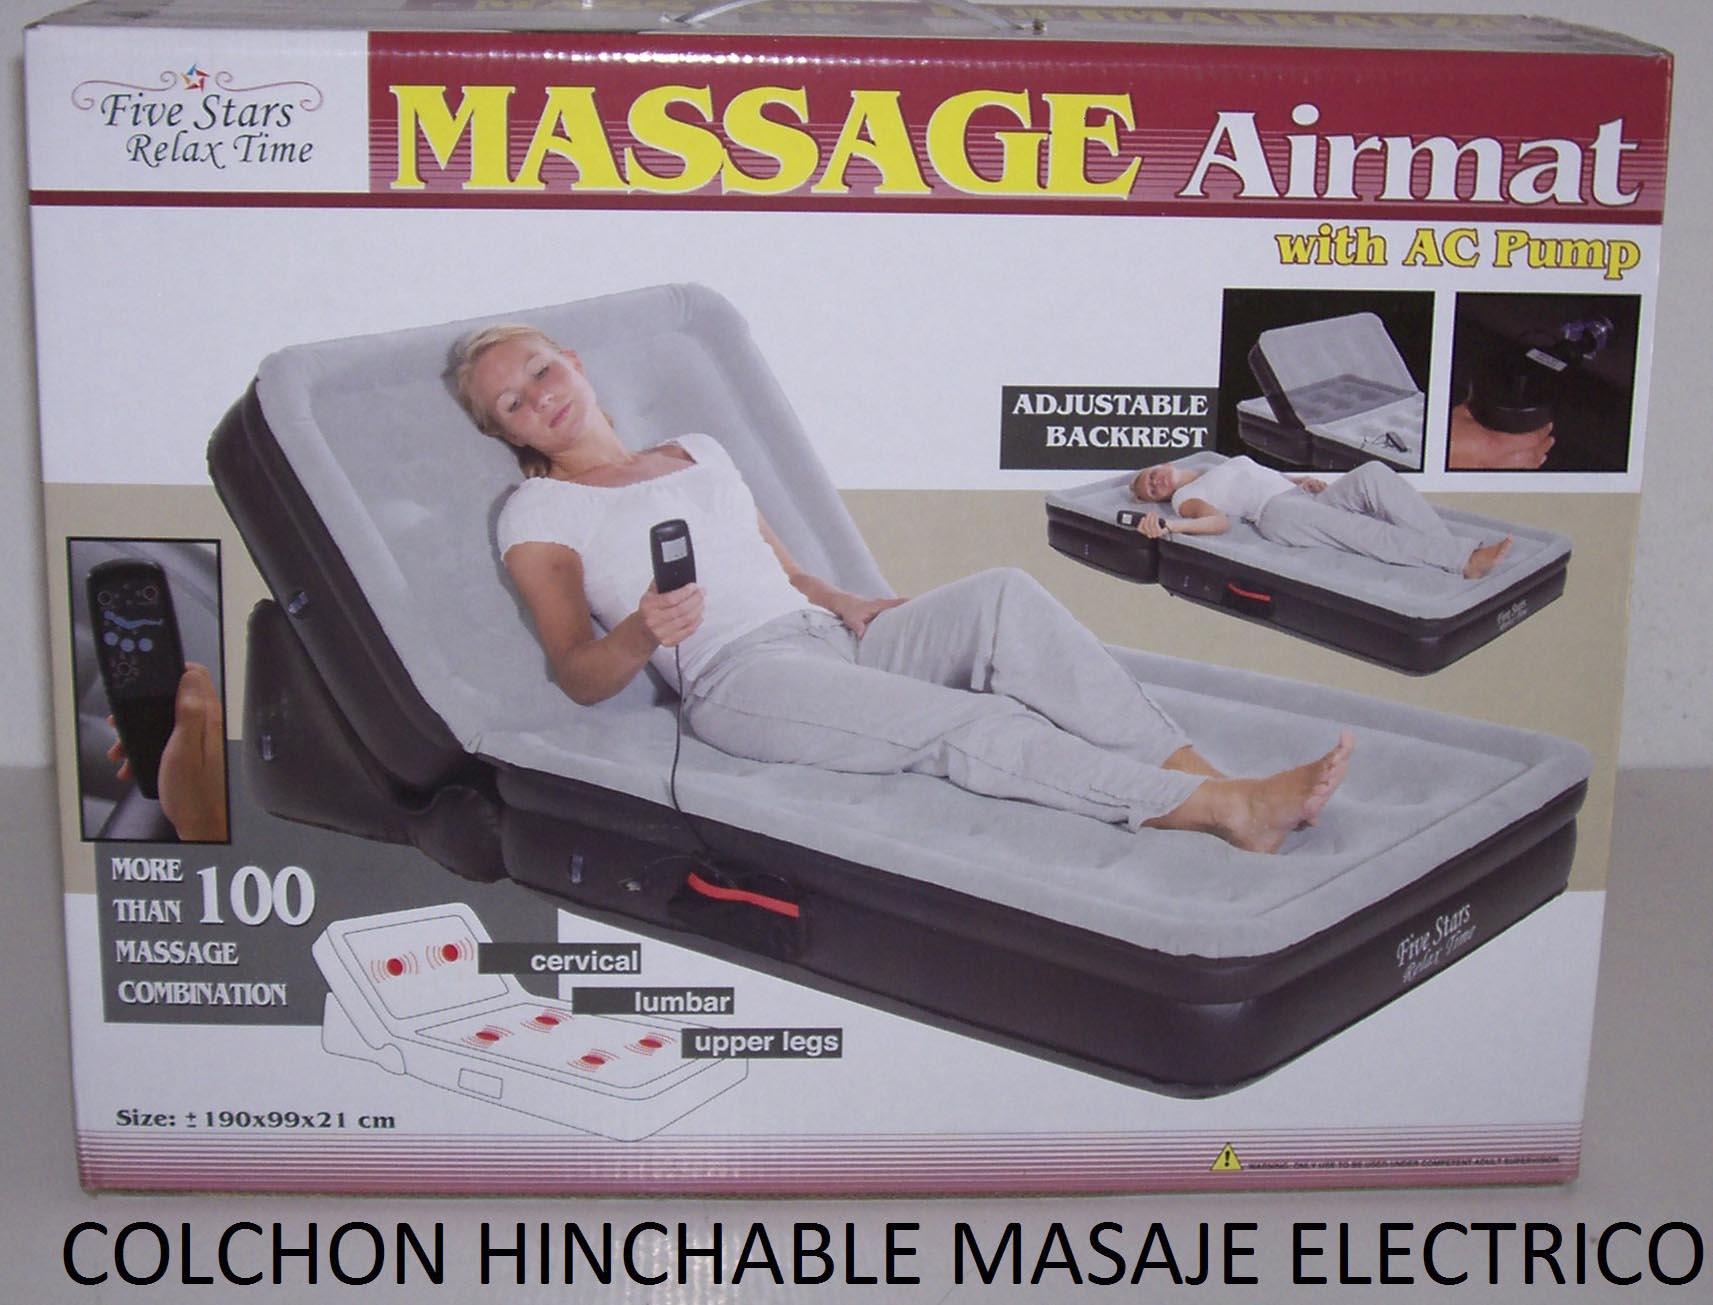 Sofa cama hinchable con masaje sillon cama anunciado en for Precio de sillon cama